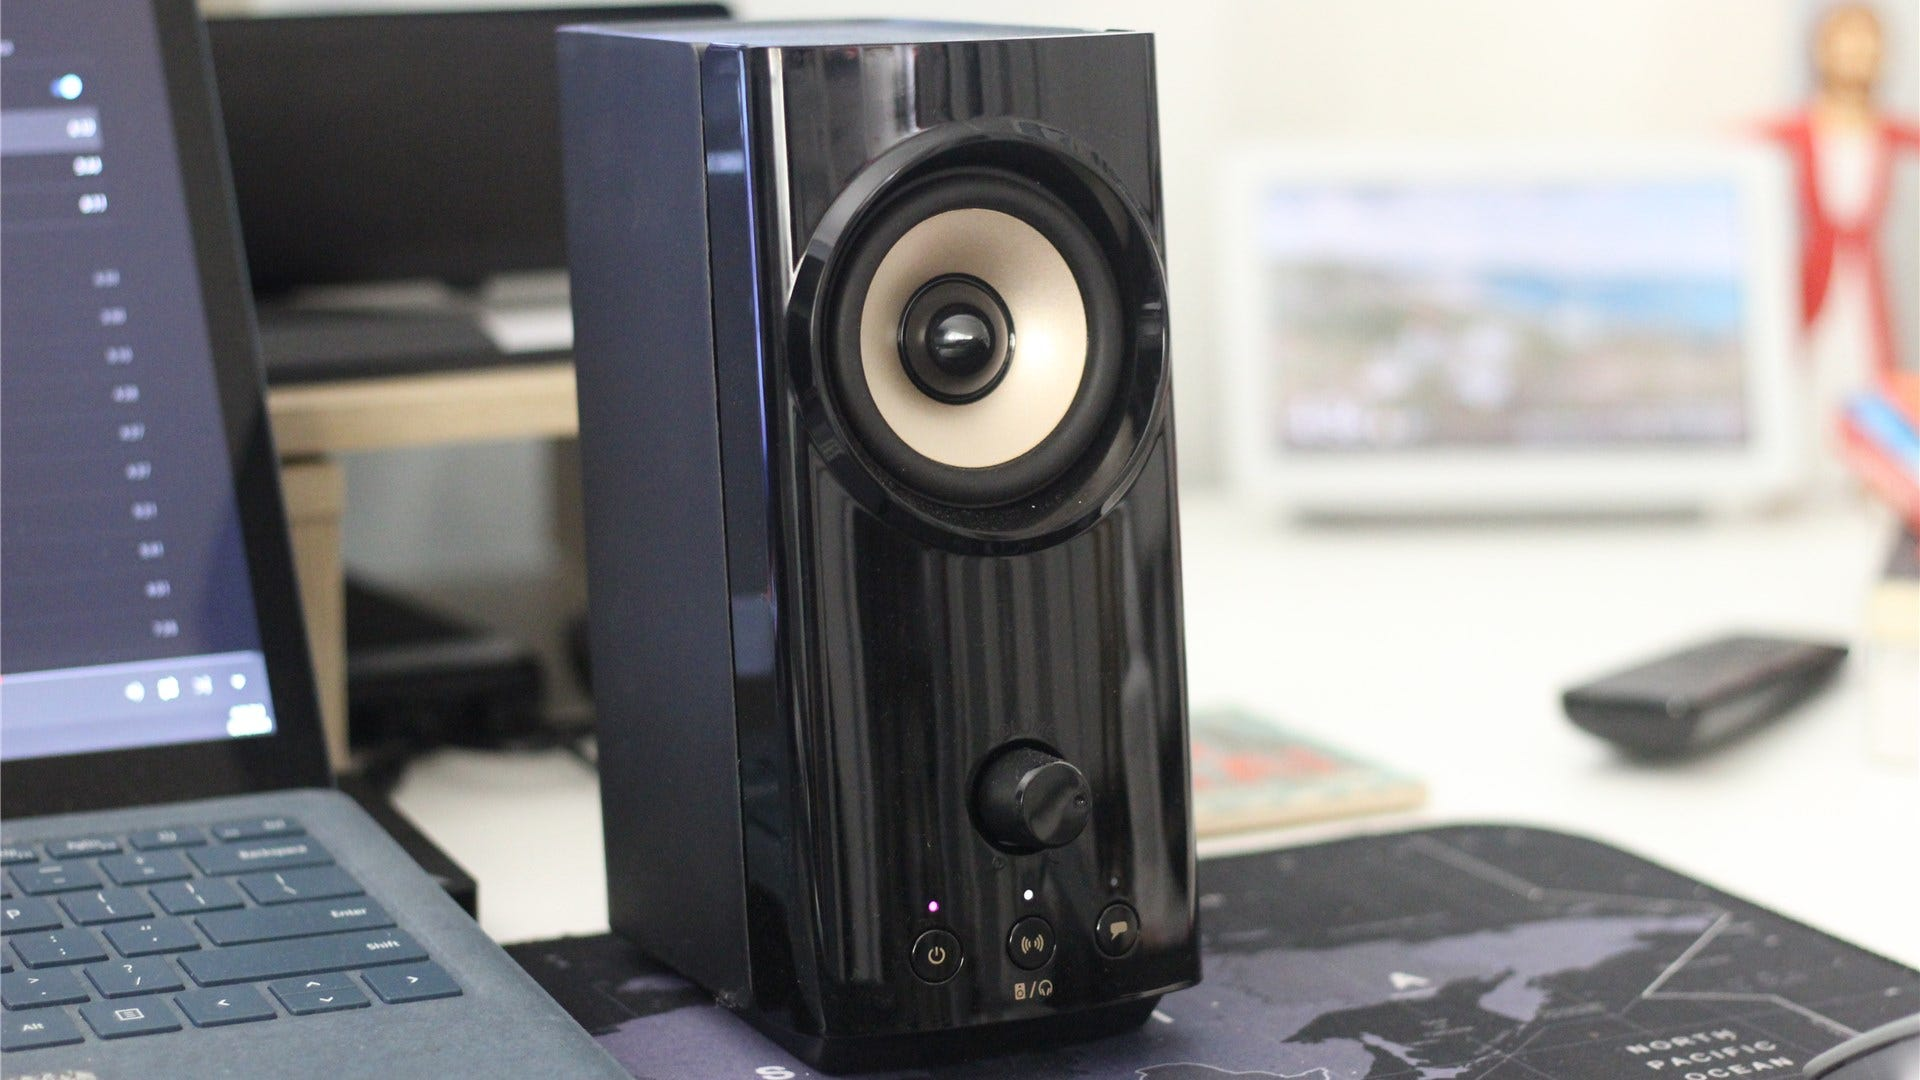 The Creative T60's right speaker